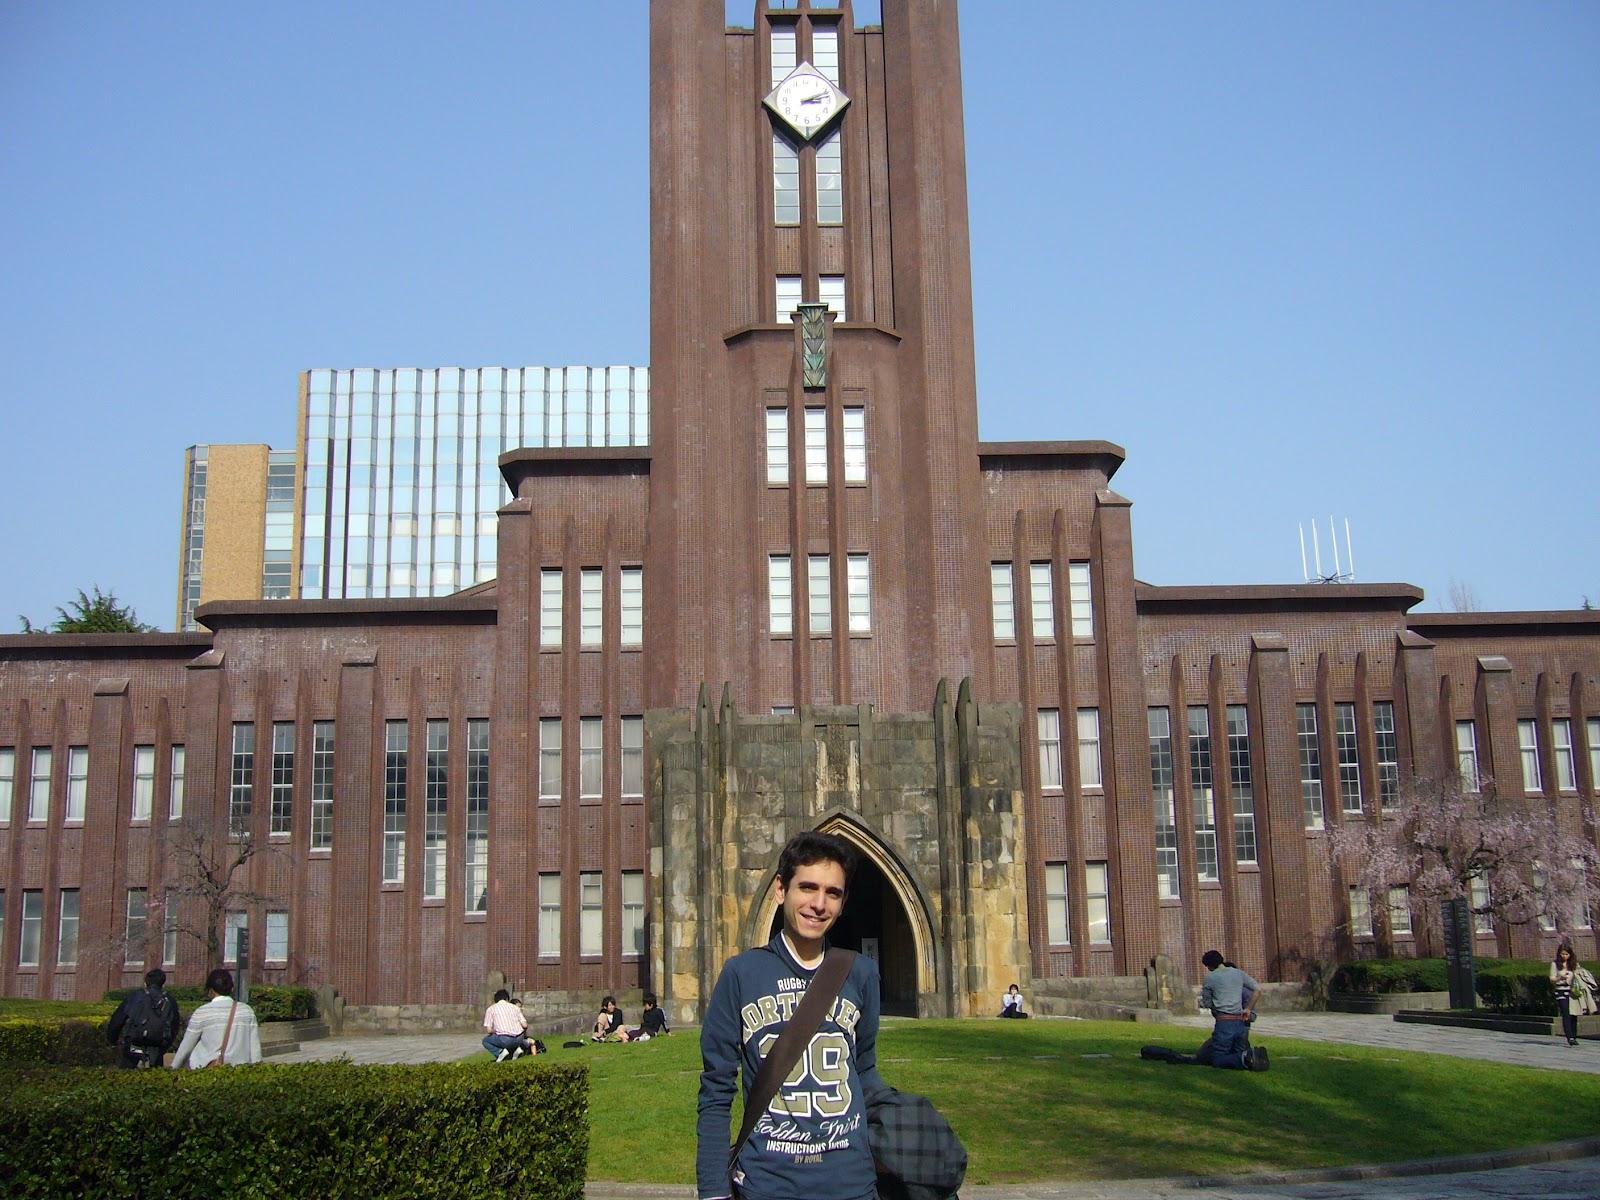 http://2.bp.blogspot.com/-f-cY1UY_0oQ/T5EOvIlkhvI/AAAAAAAAlPE/g9j4dhY1a9k/s1600/Tokyo+university+%288%29.JPG